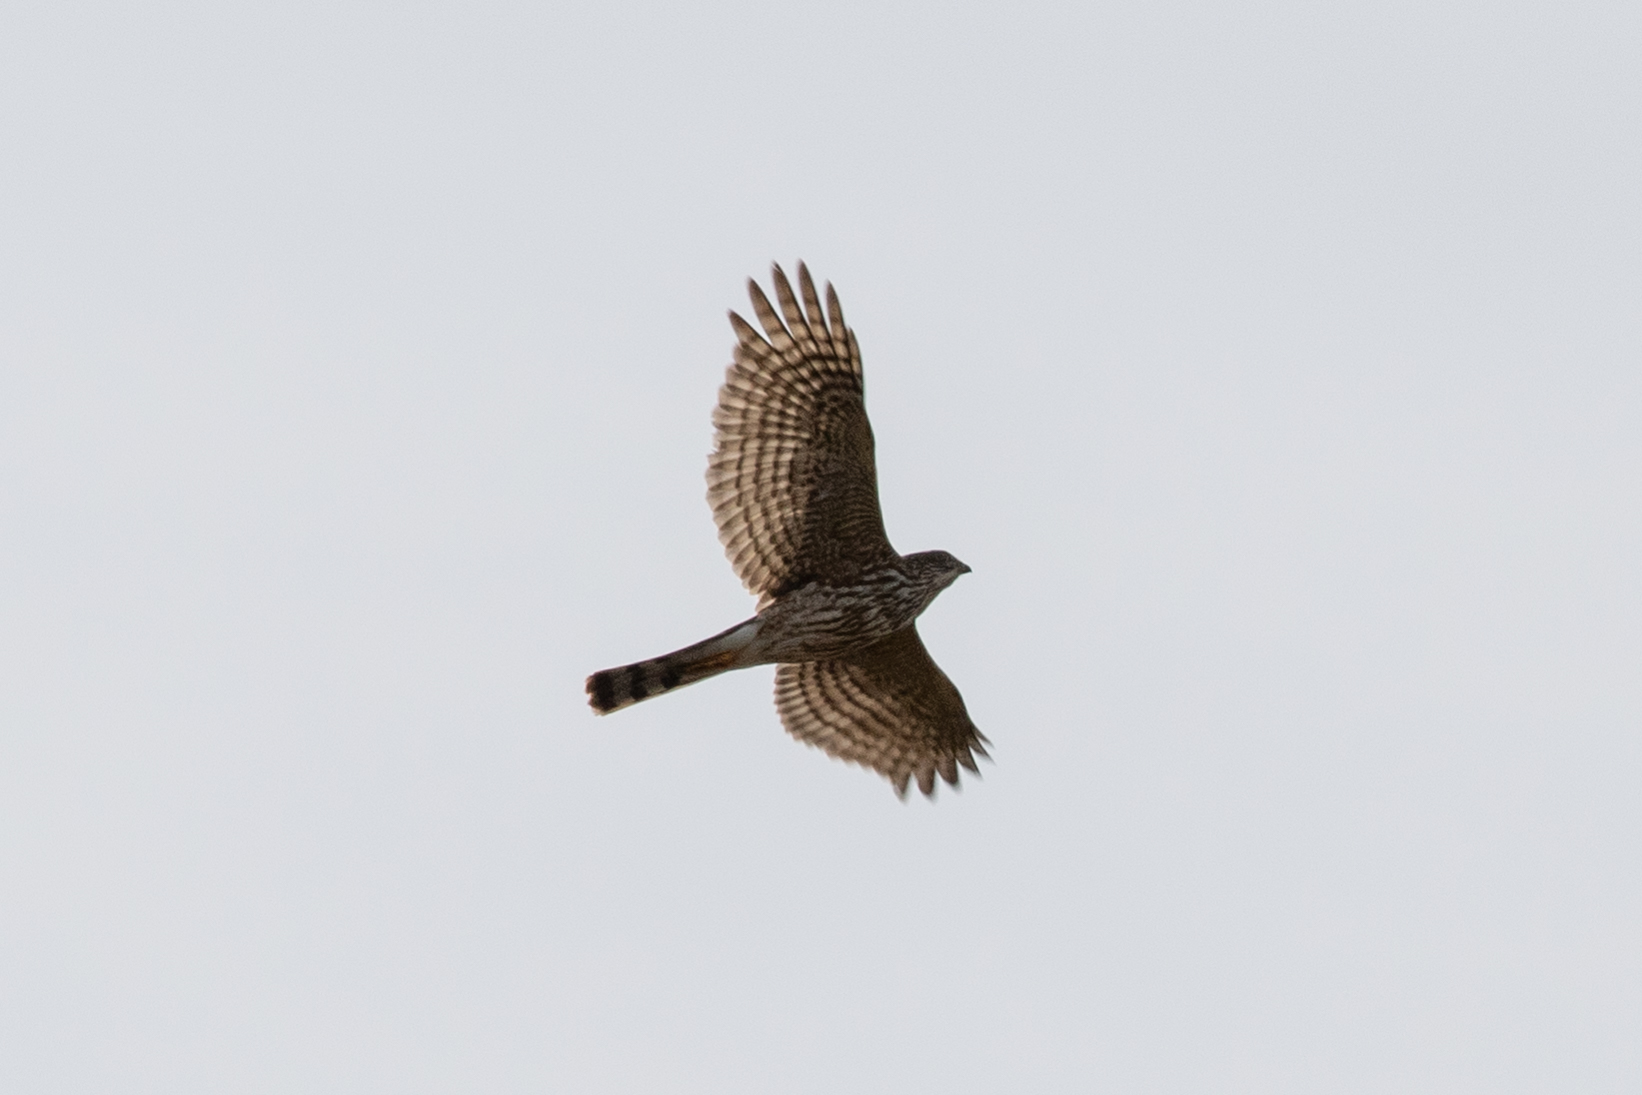 Sharp-shinned Hawk, immature